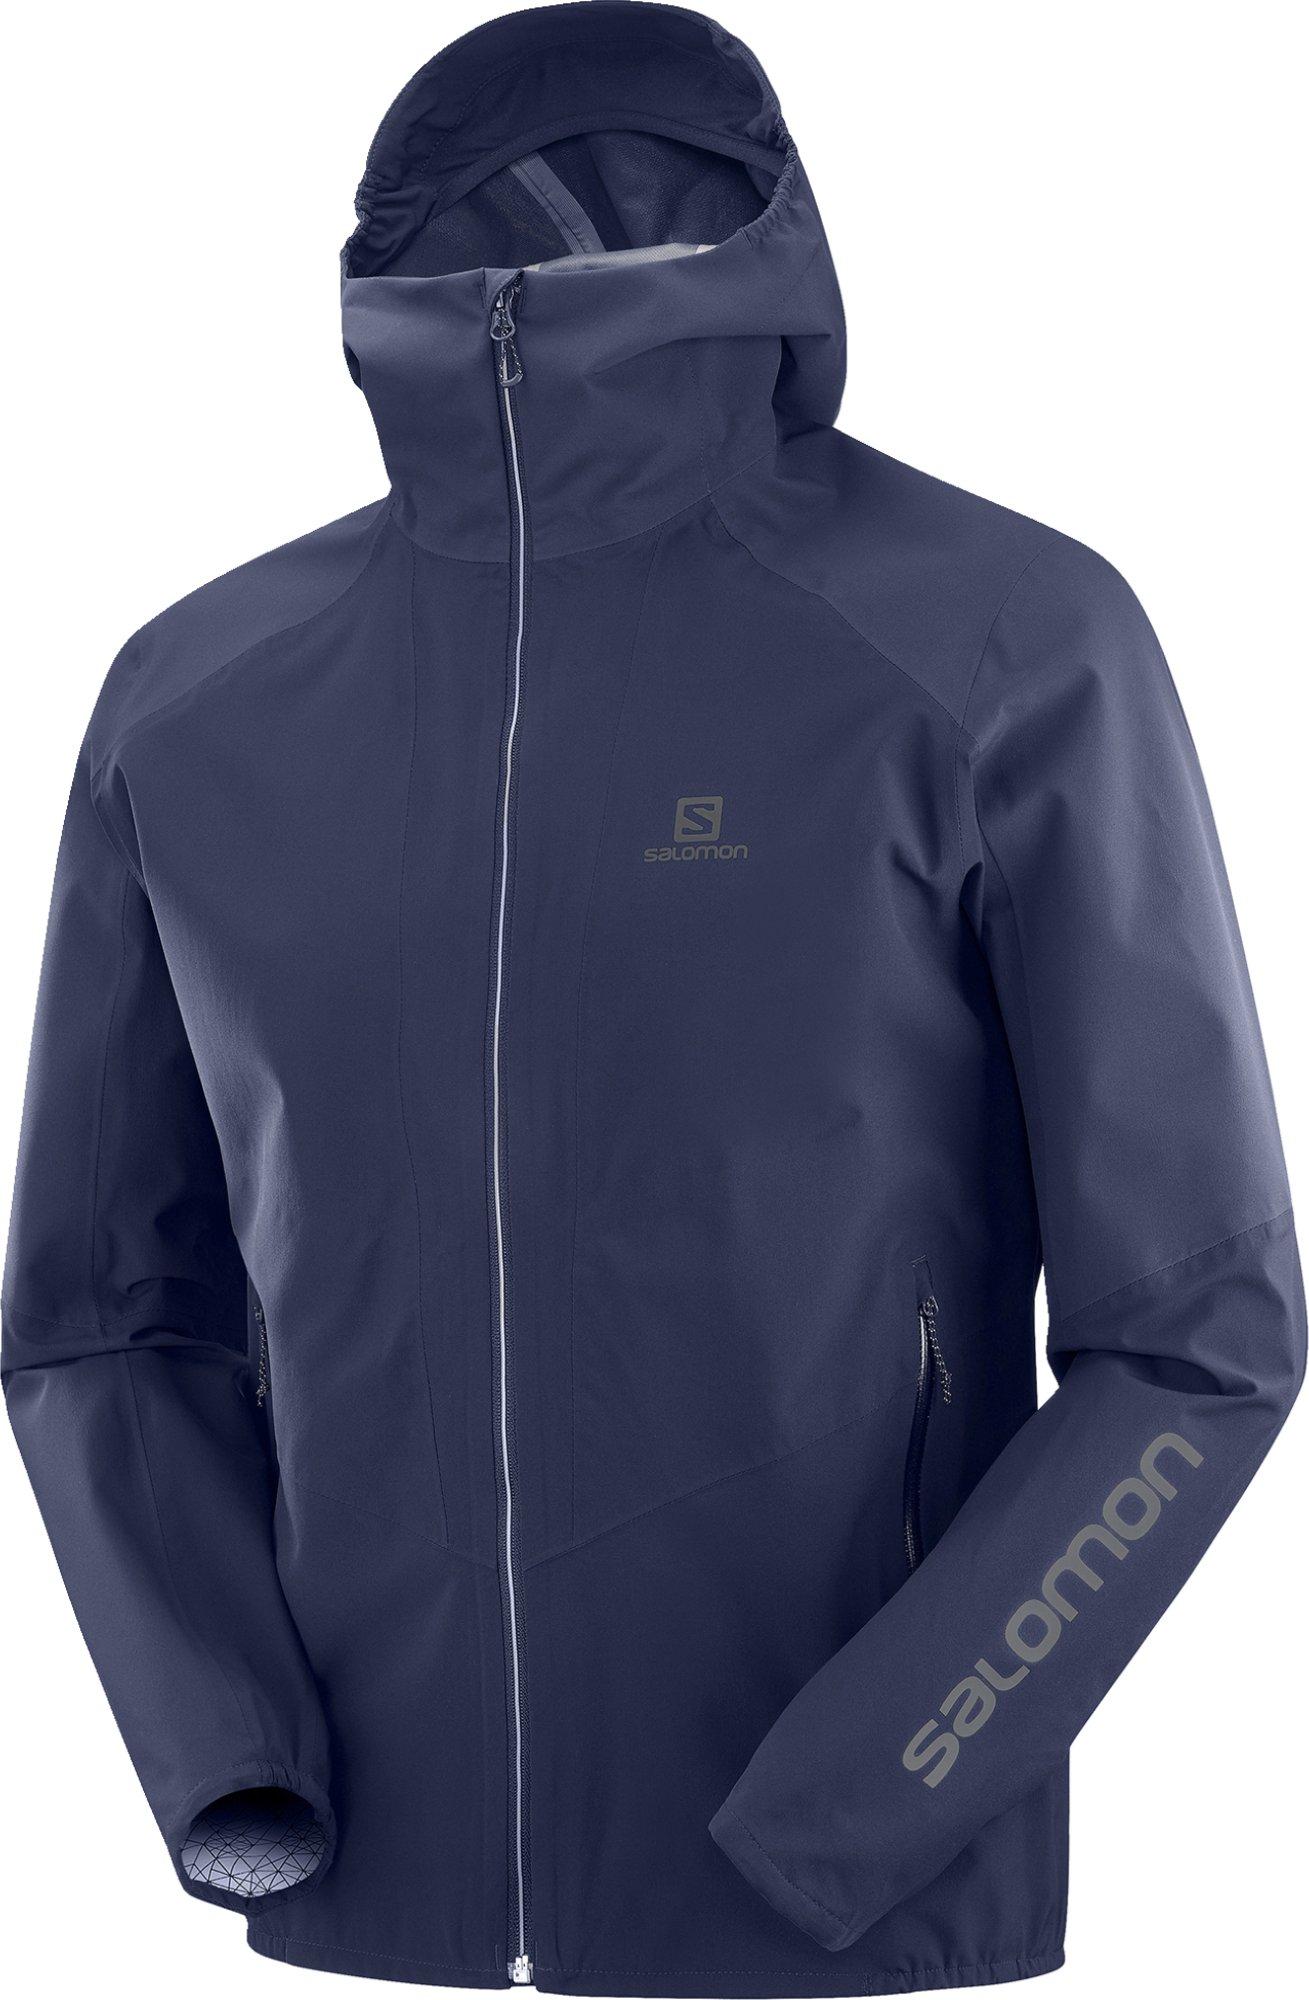 Salomon Outline Jacket (Herre)